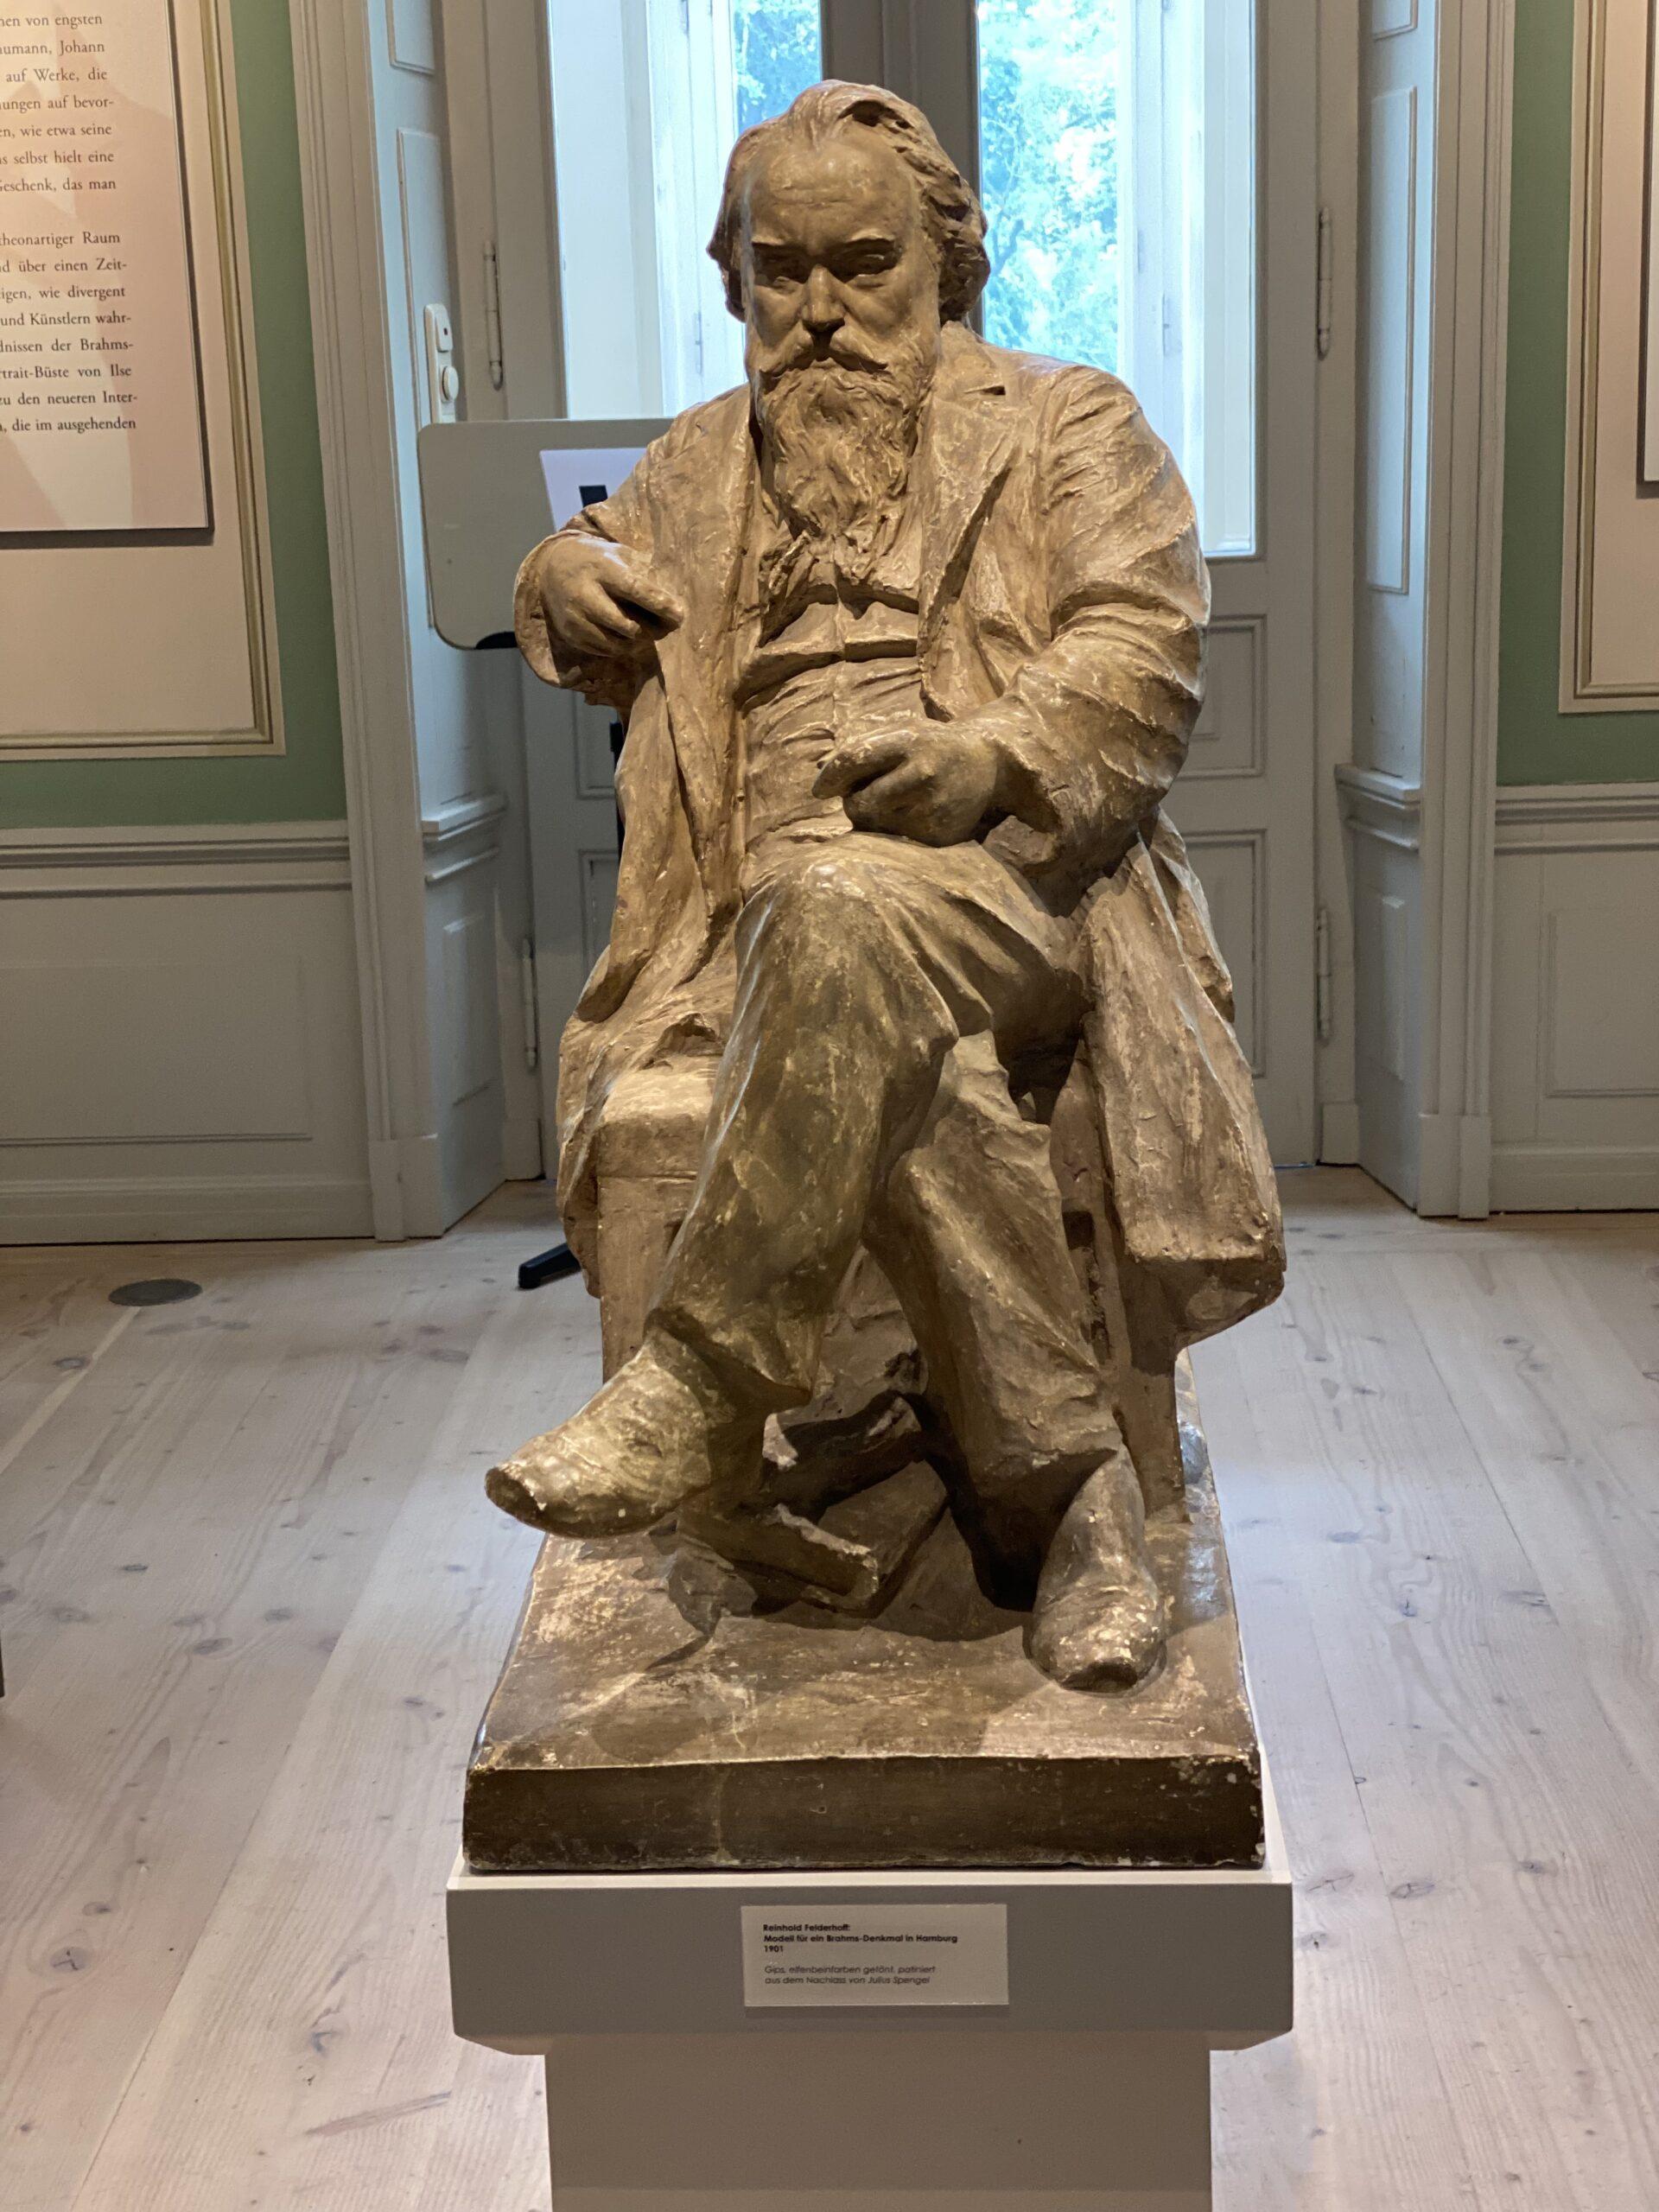 Brahms Skulptur scaled